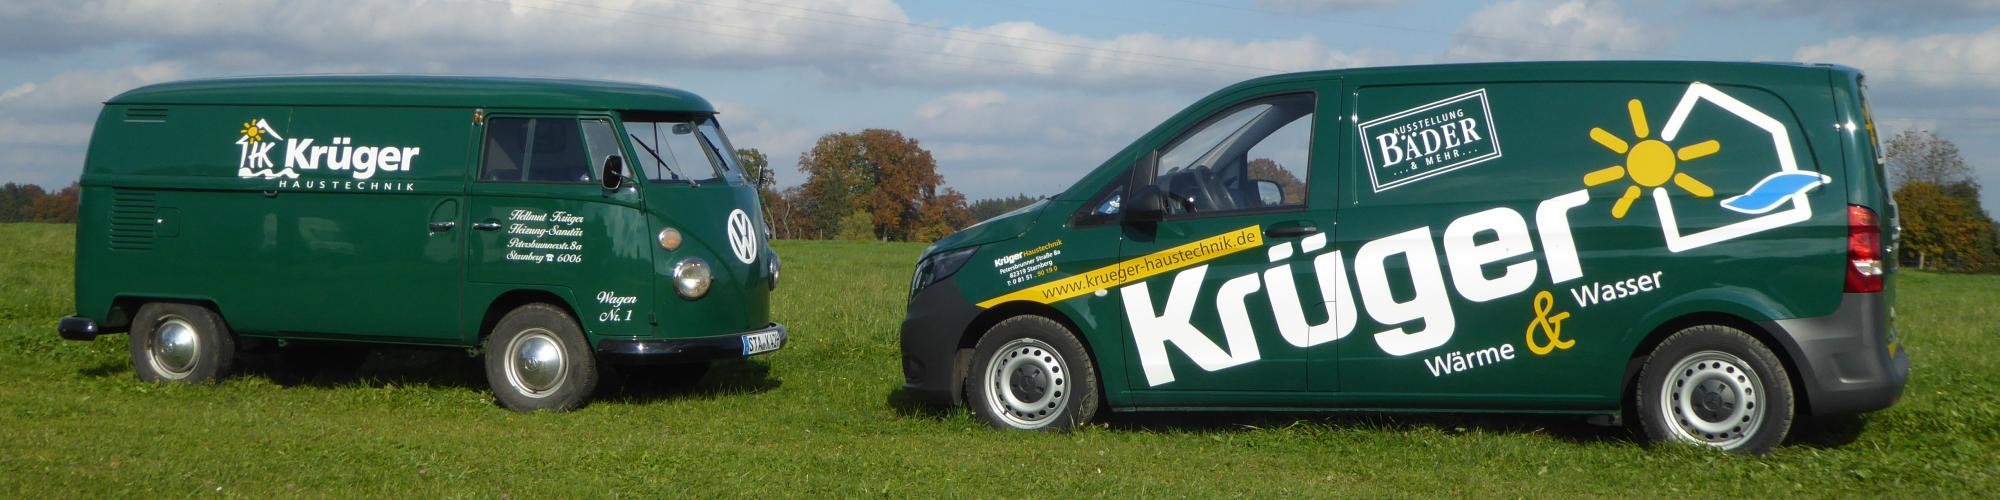 Krüger Heizung - Sanitär GmbH & Co KG